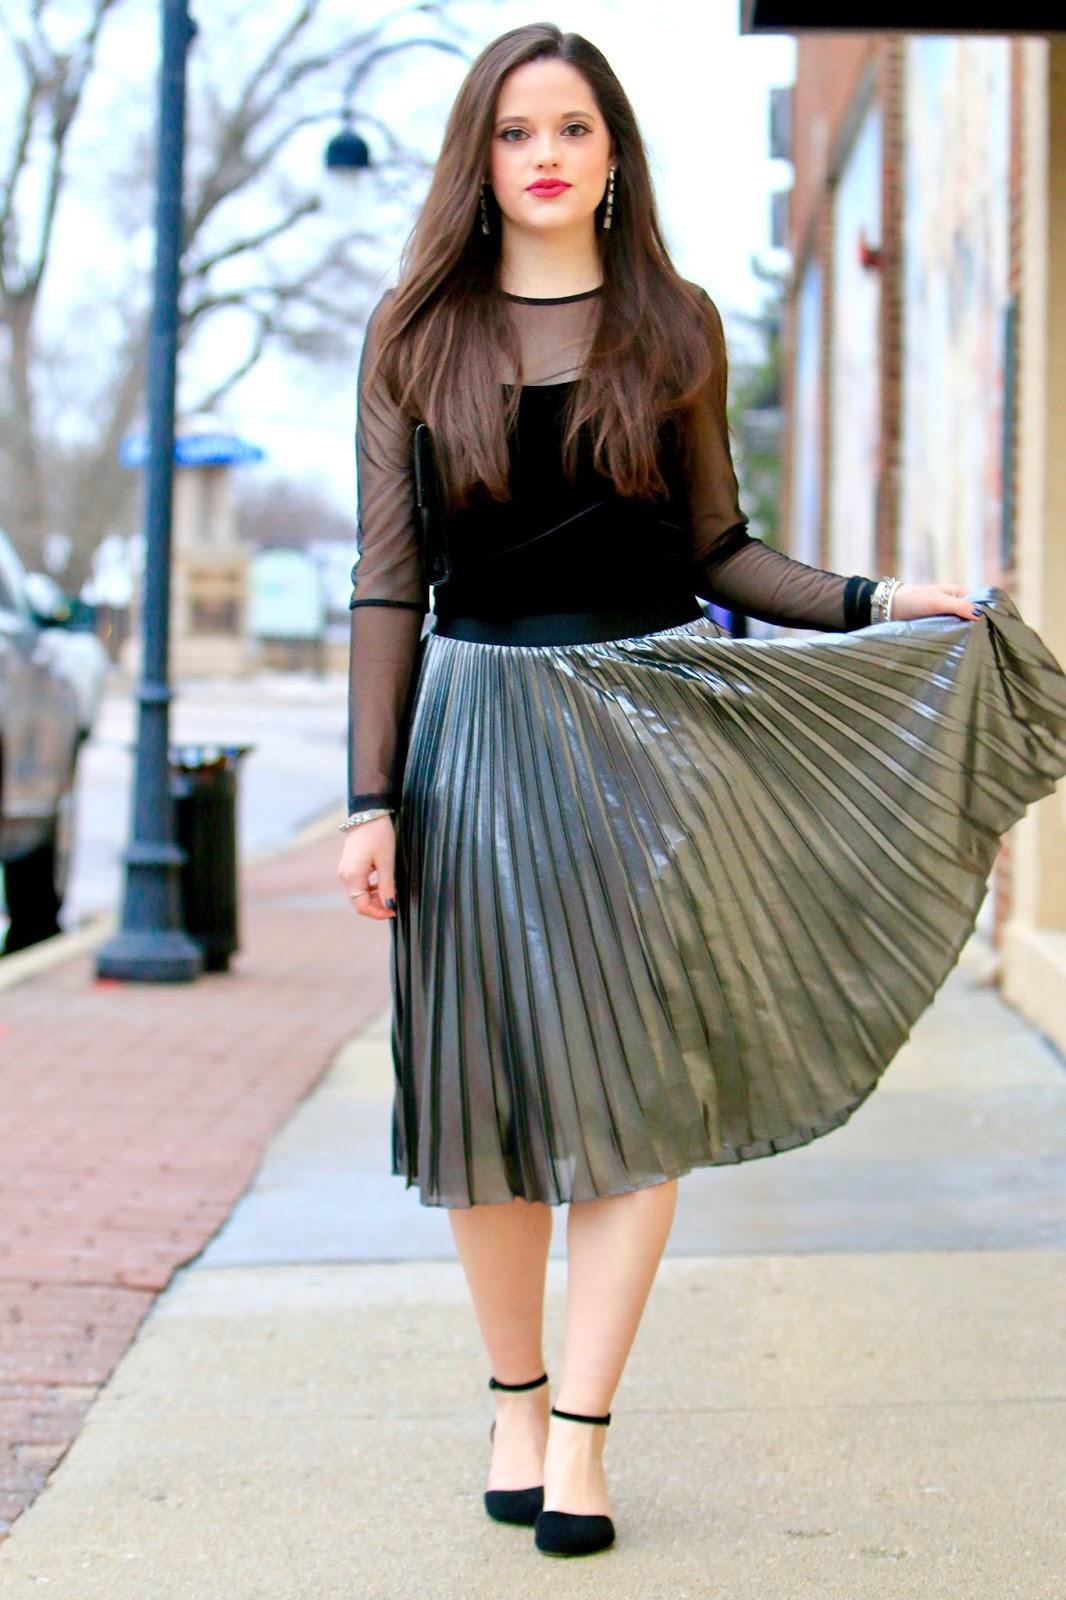 metallic skirt pics